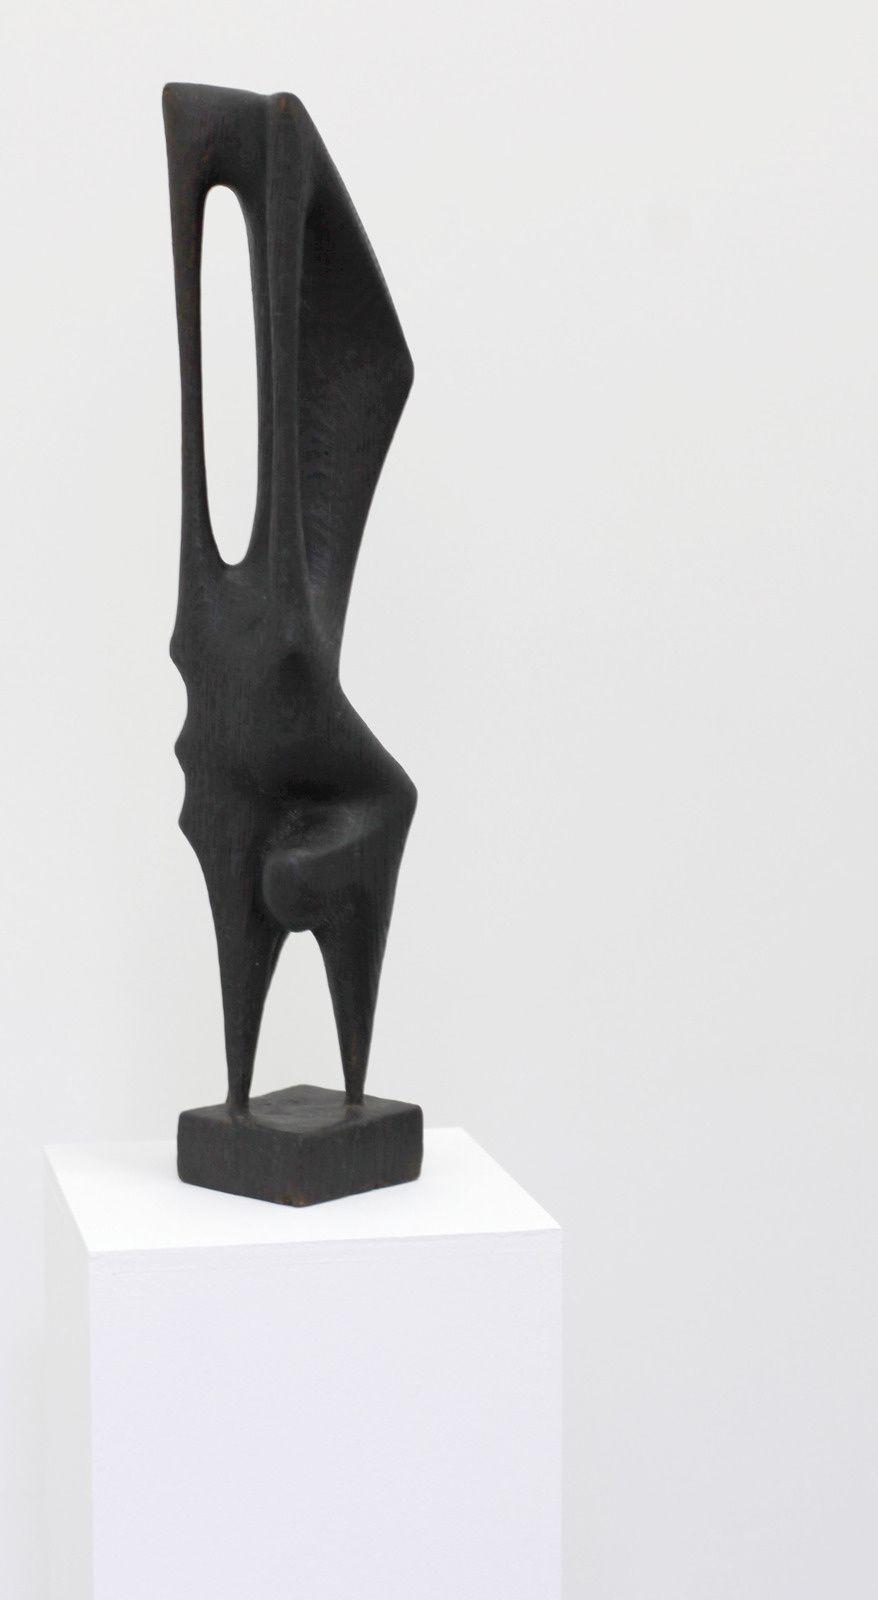 """Repos"", 1960 de Agustin CÀRDENAS - Courtesy Galerie MITTERRAND © Photo Éric Simon"